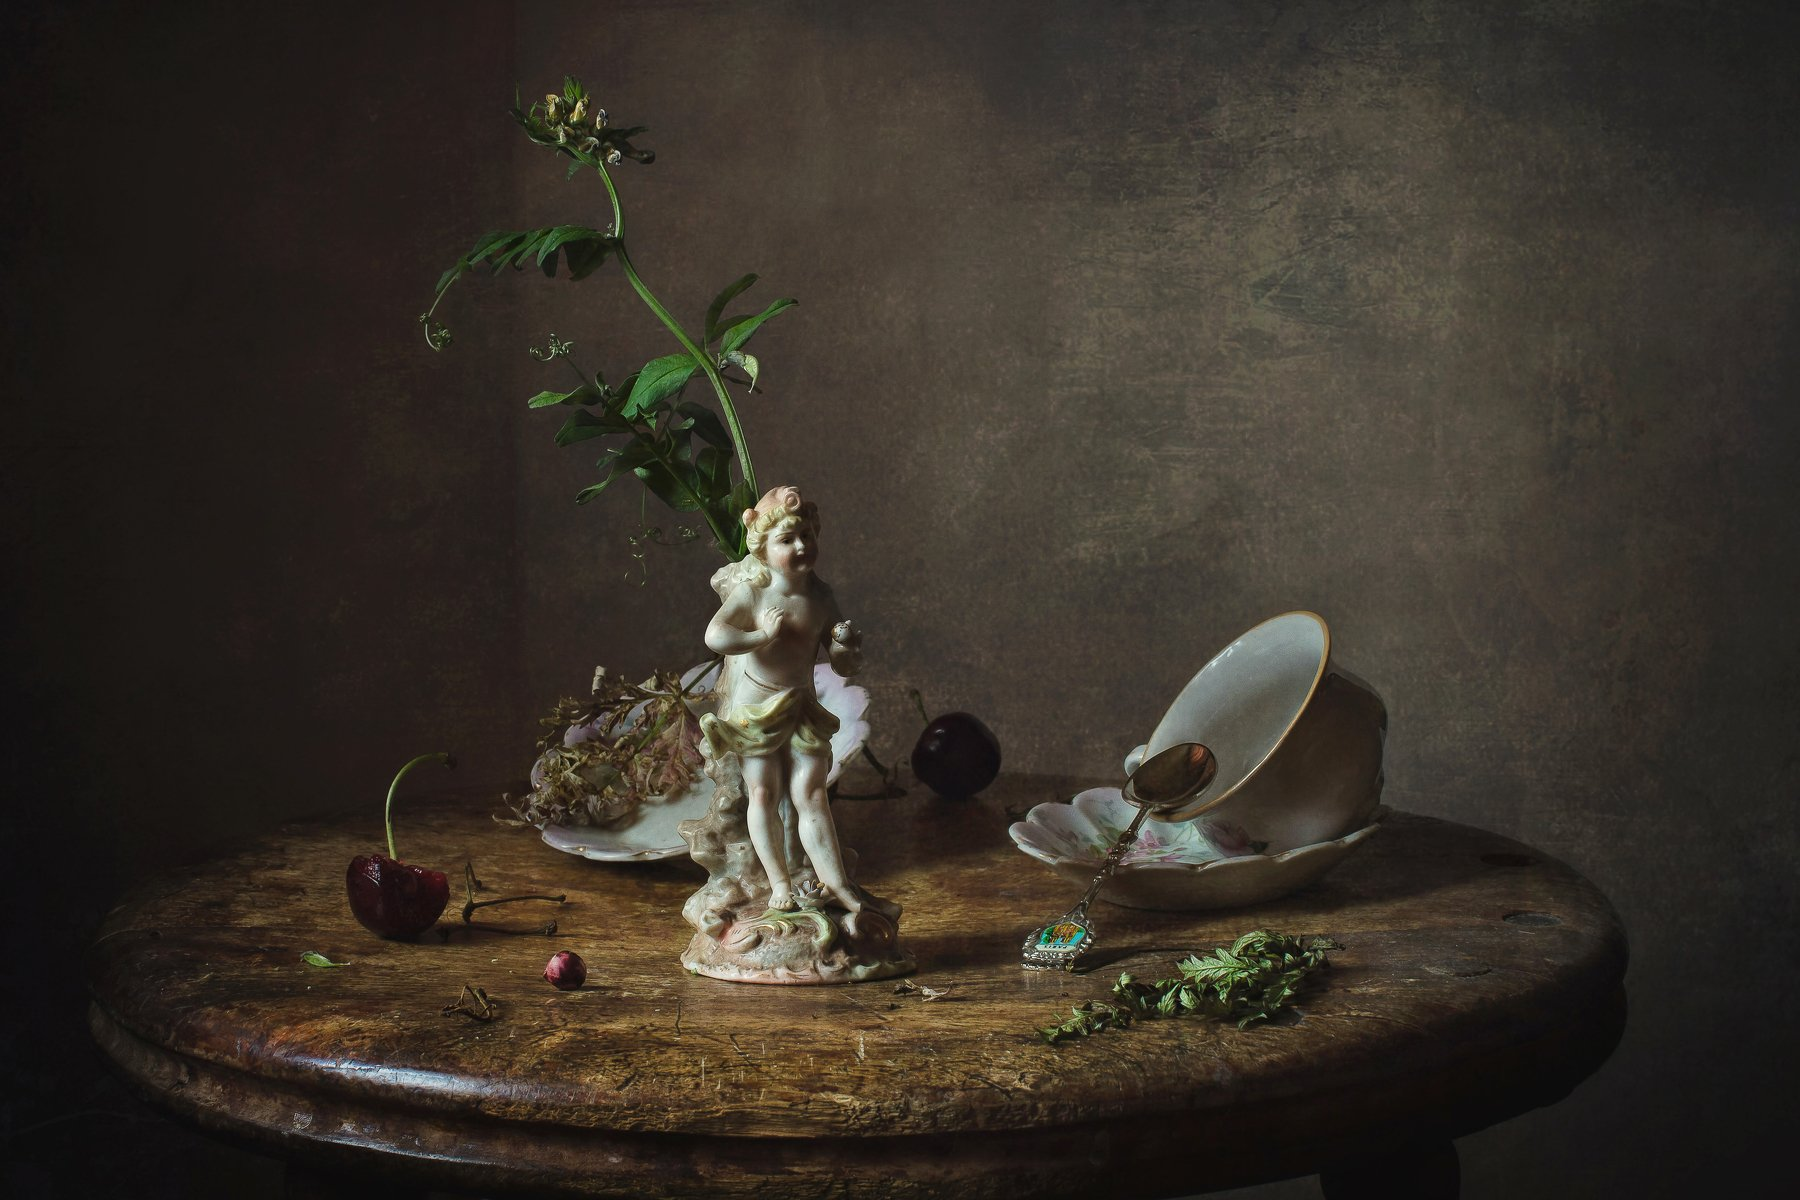 натюрморт, фарфор, статуэтка, цветок, ягоды, вишня, Анна Петина